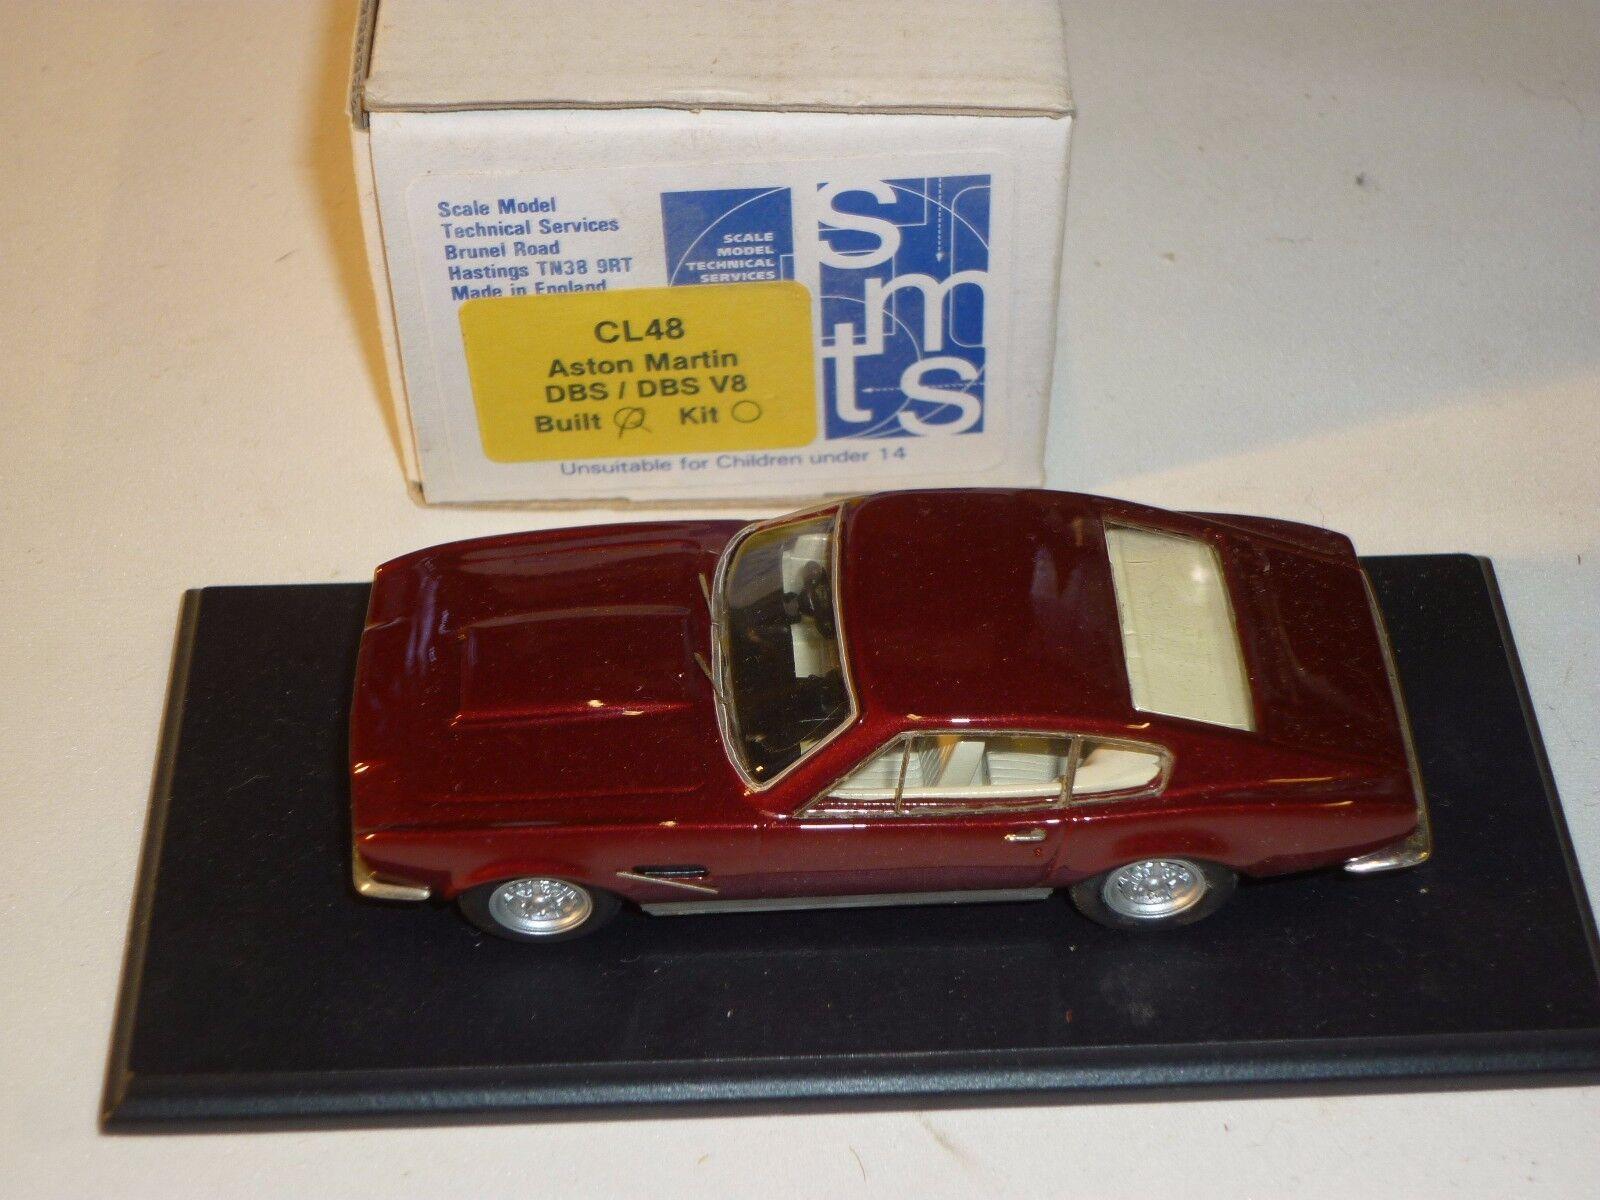 SMTS models CL48 Aston Martin DBS V8, Boxed,